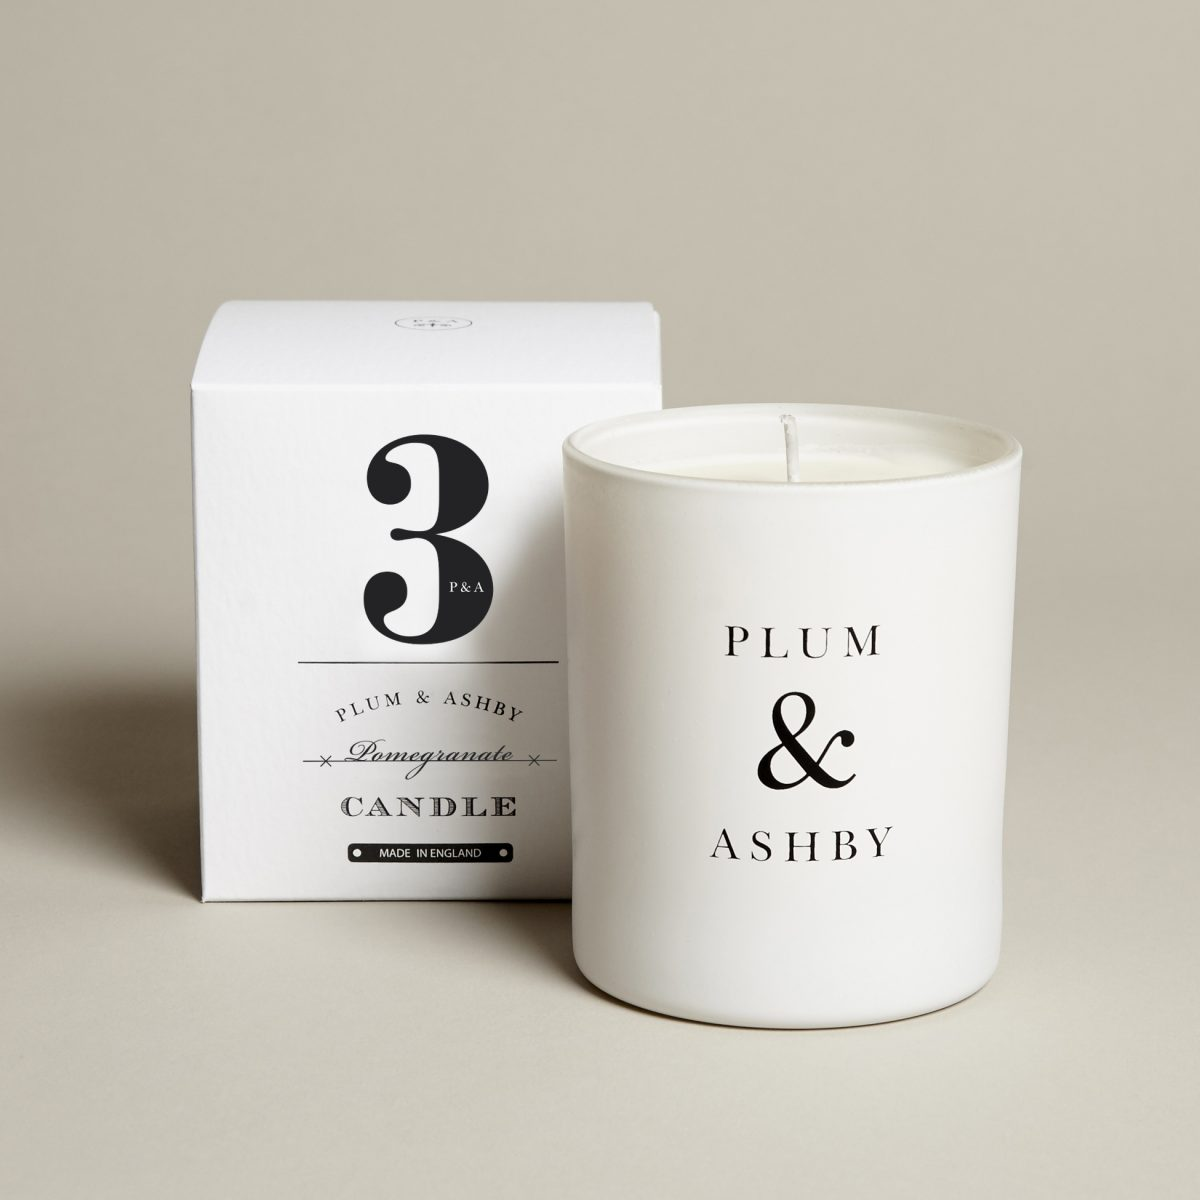 3 Pomegranate Candle